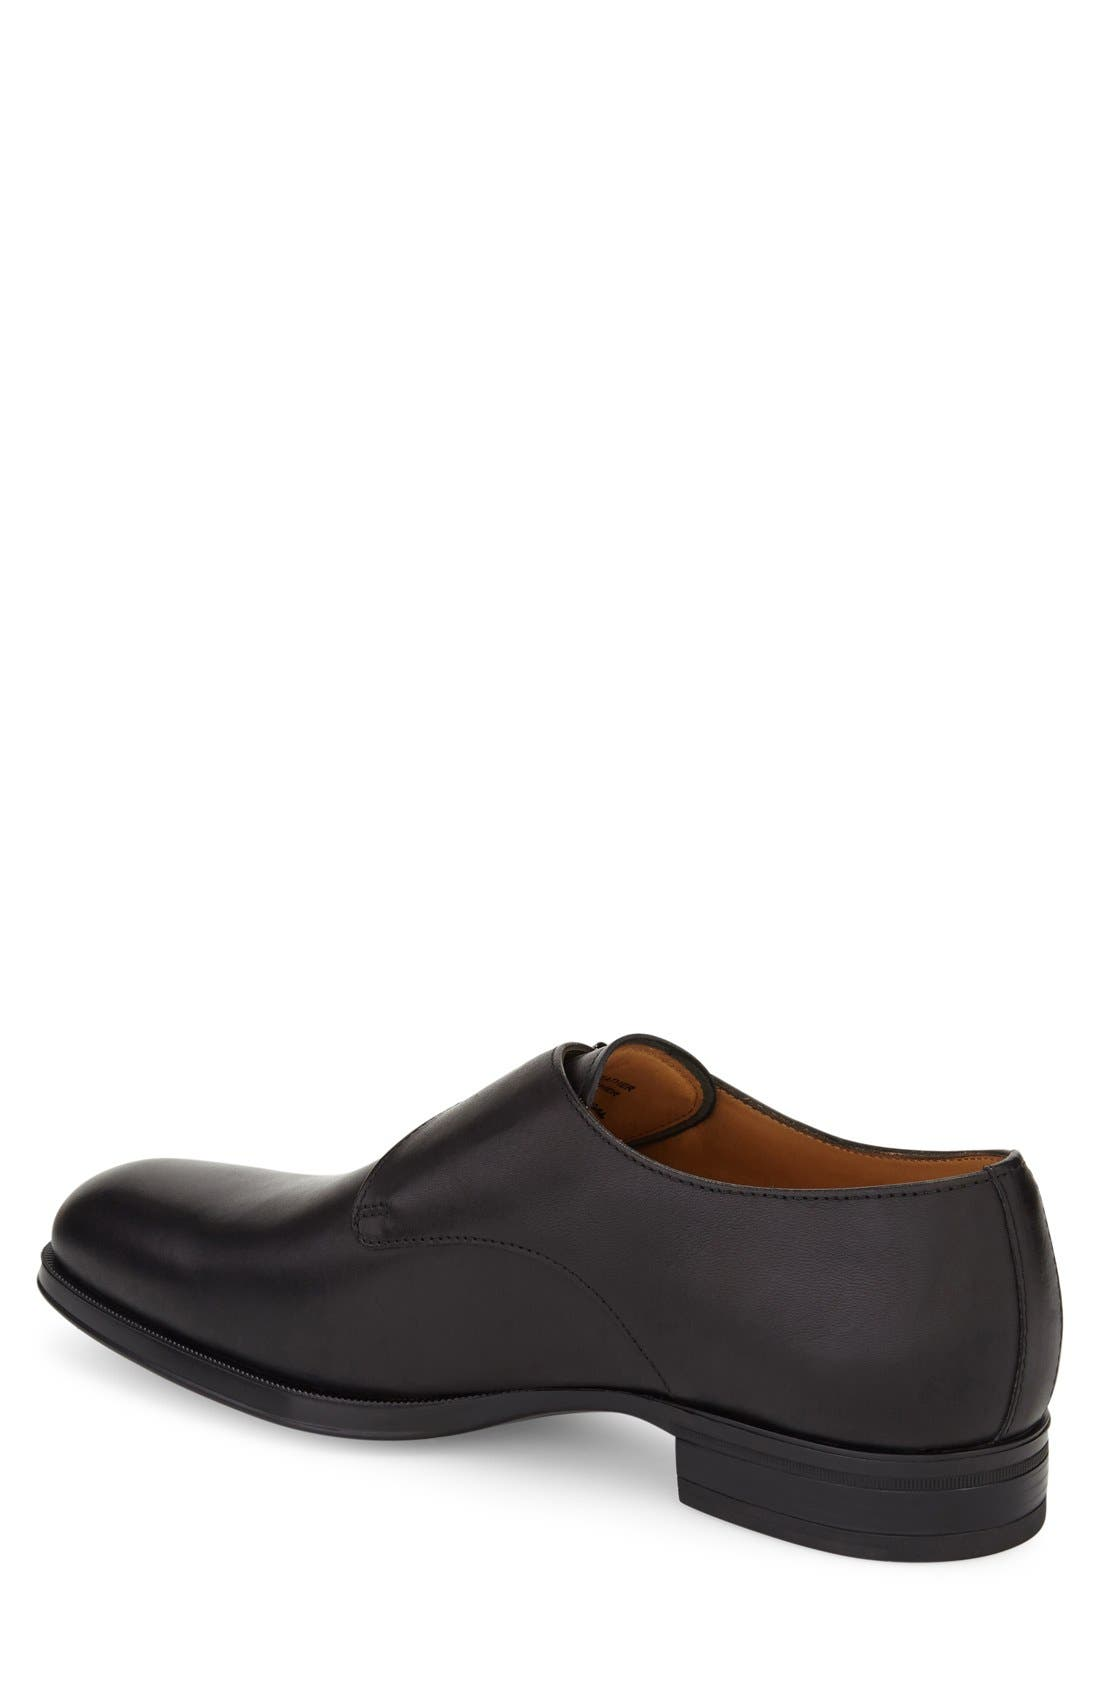 Alternate Image 2  - Vince Camuto 'Trifolo' Monk Strap Shoe (Men)